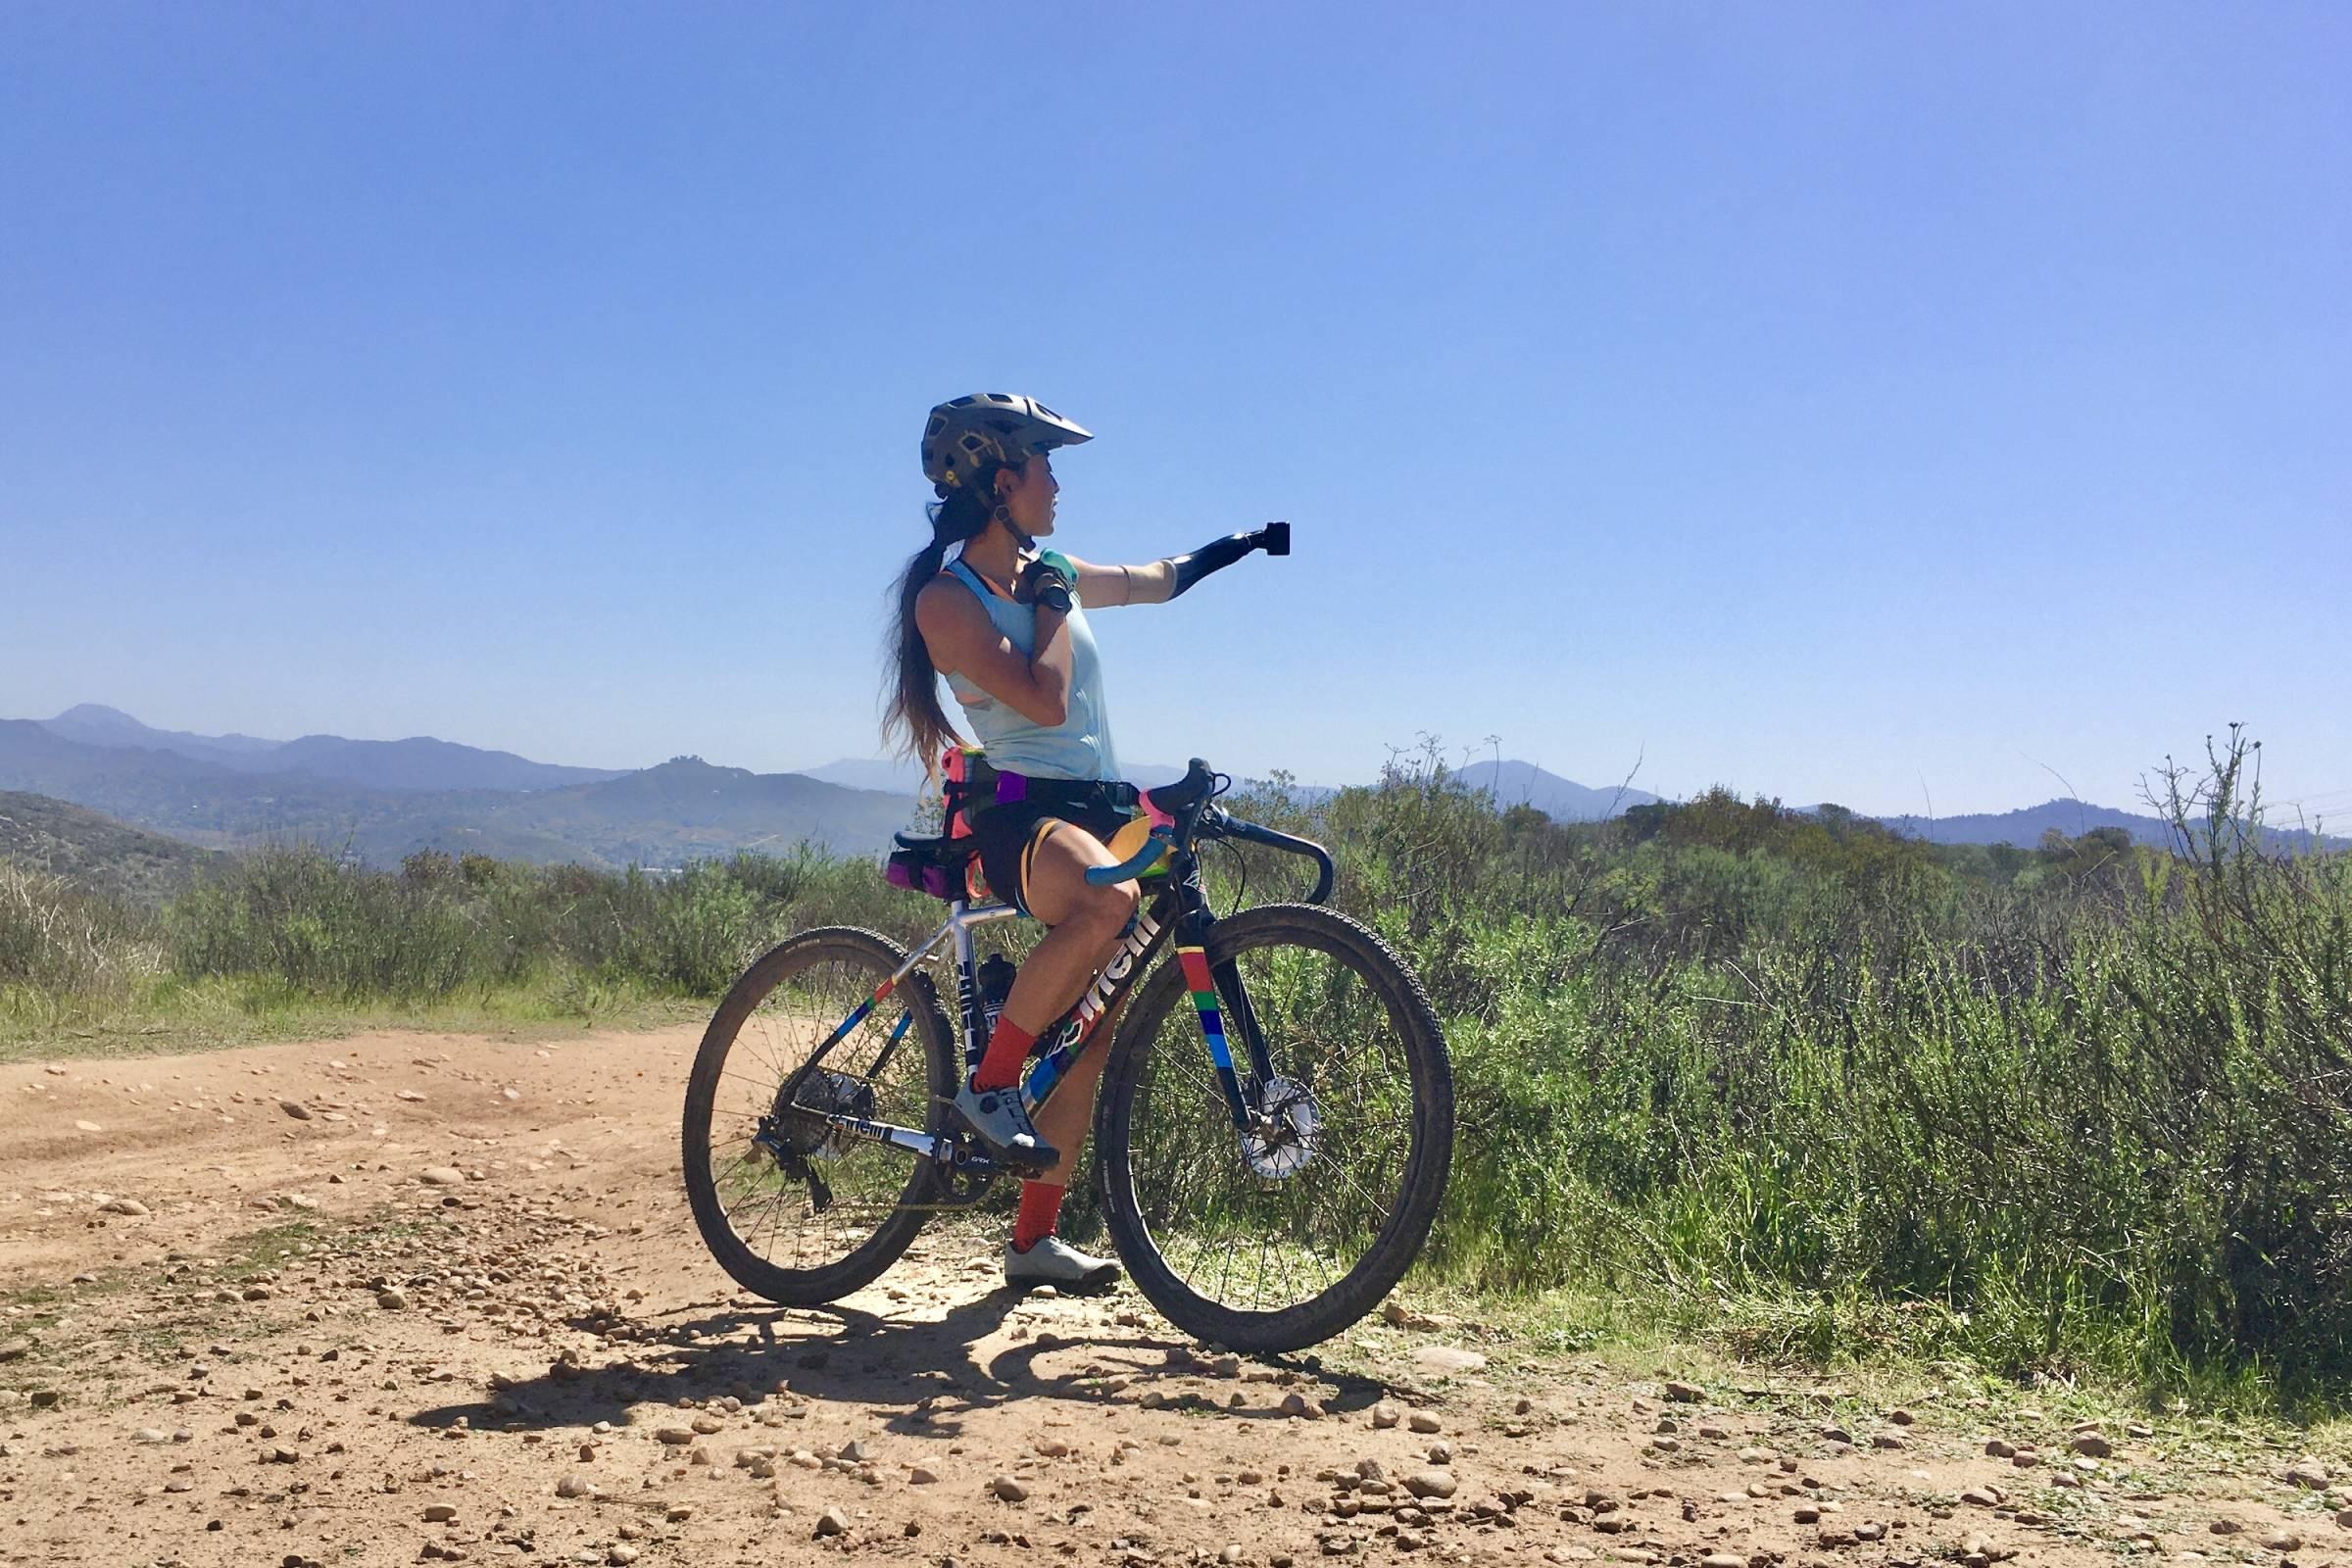 Josie Fouts straddling her bike, pointing towards route on horizon